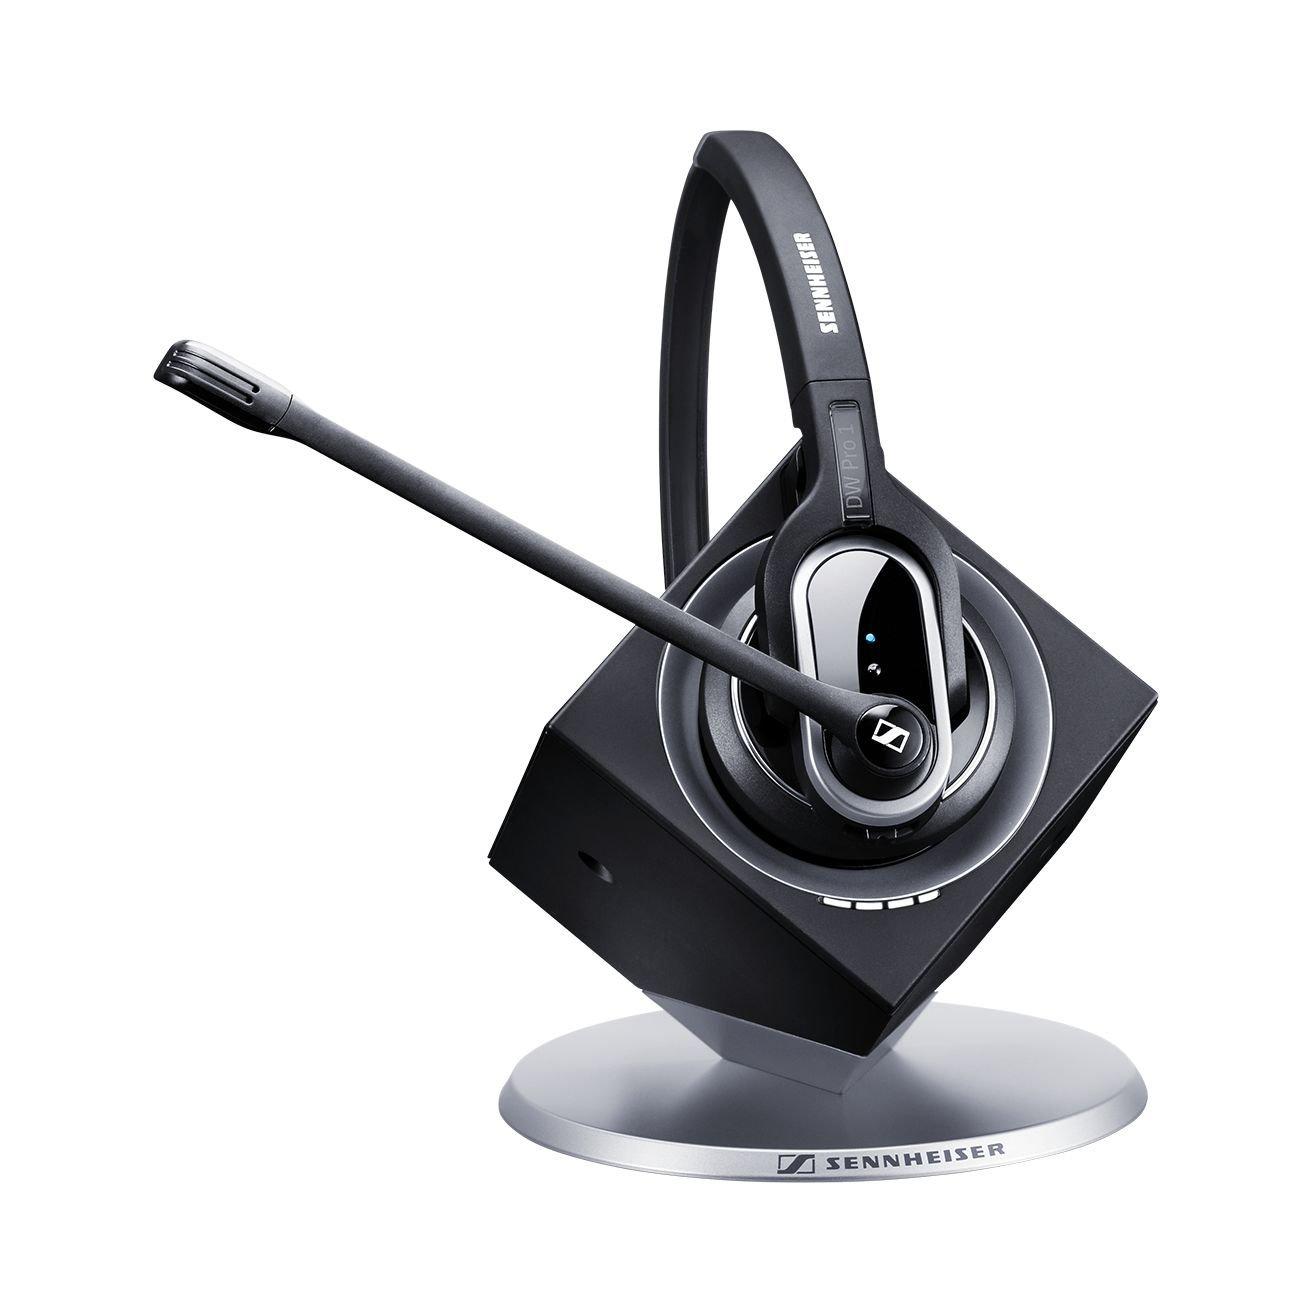 Sennheiser DW Pro 1 Wireless Headset (DW 20) (Dual Connectivity) Works With - Desk Phone + PC, 12 Hour Talk Time, 180M Wireless Range, 2 Year Warrant